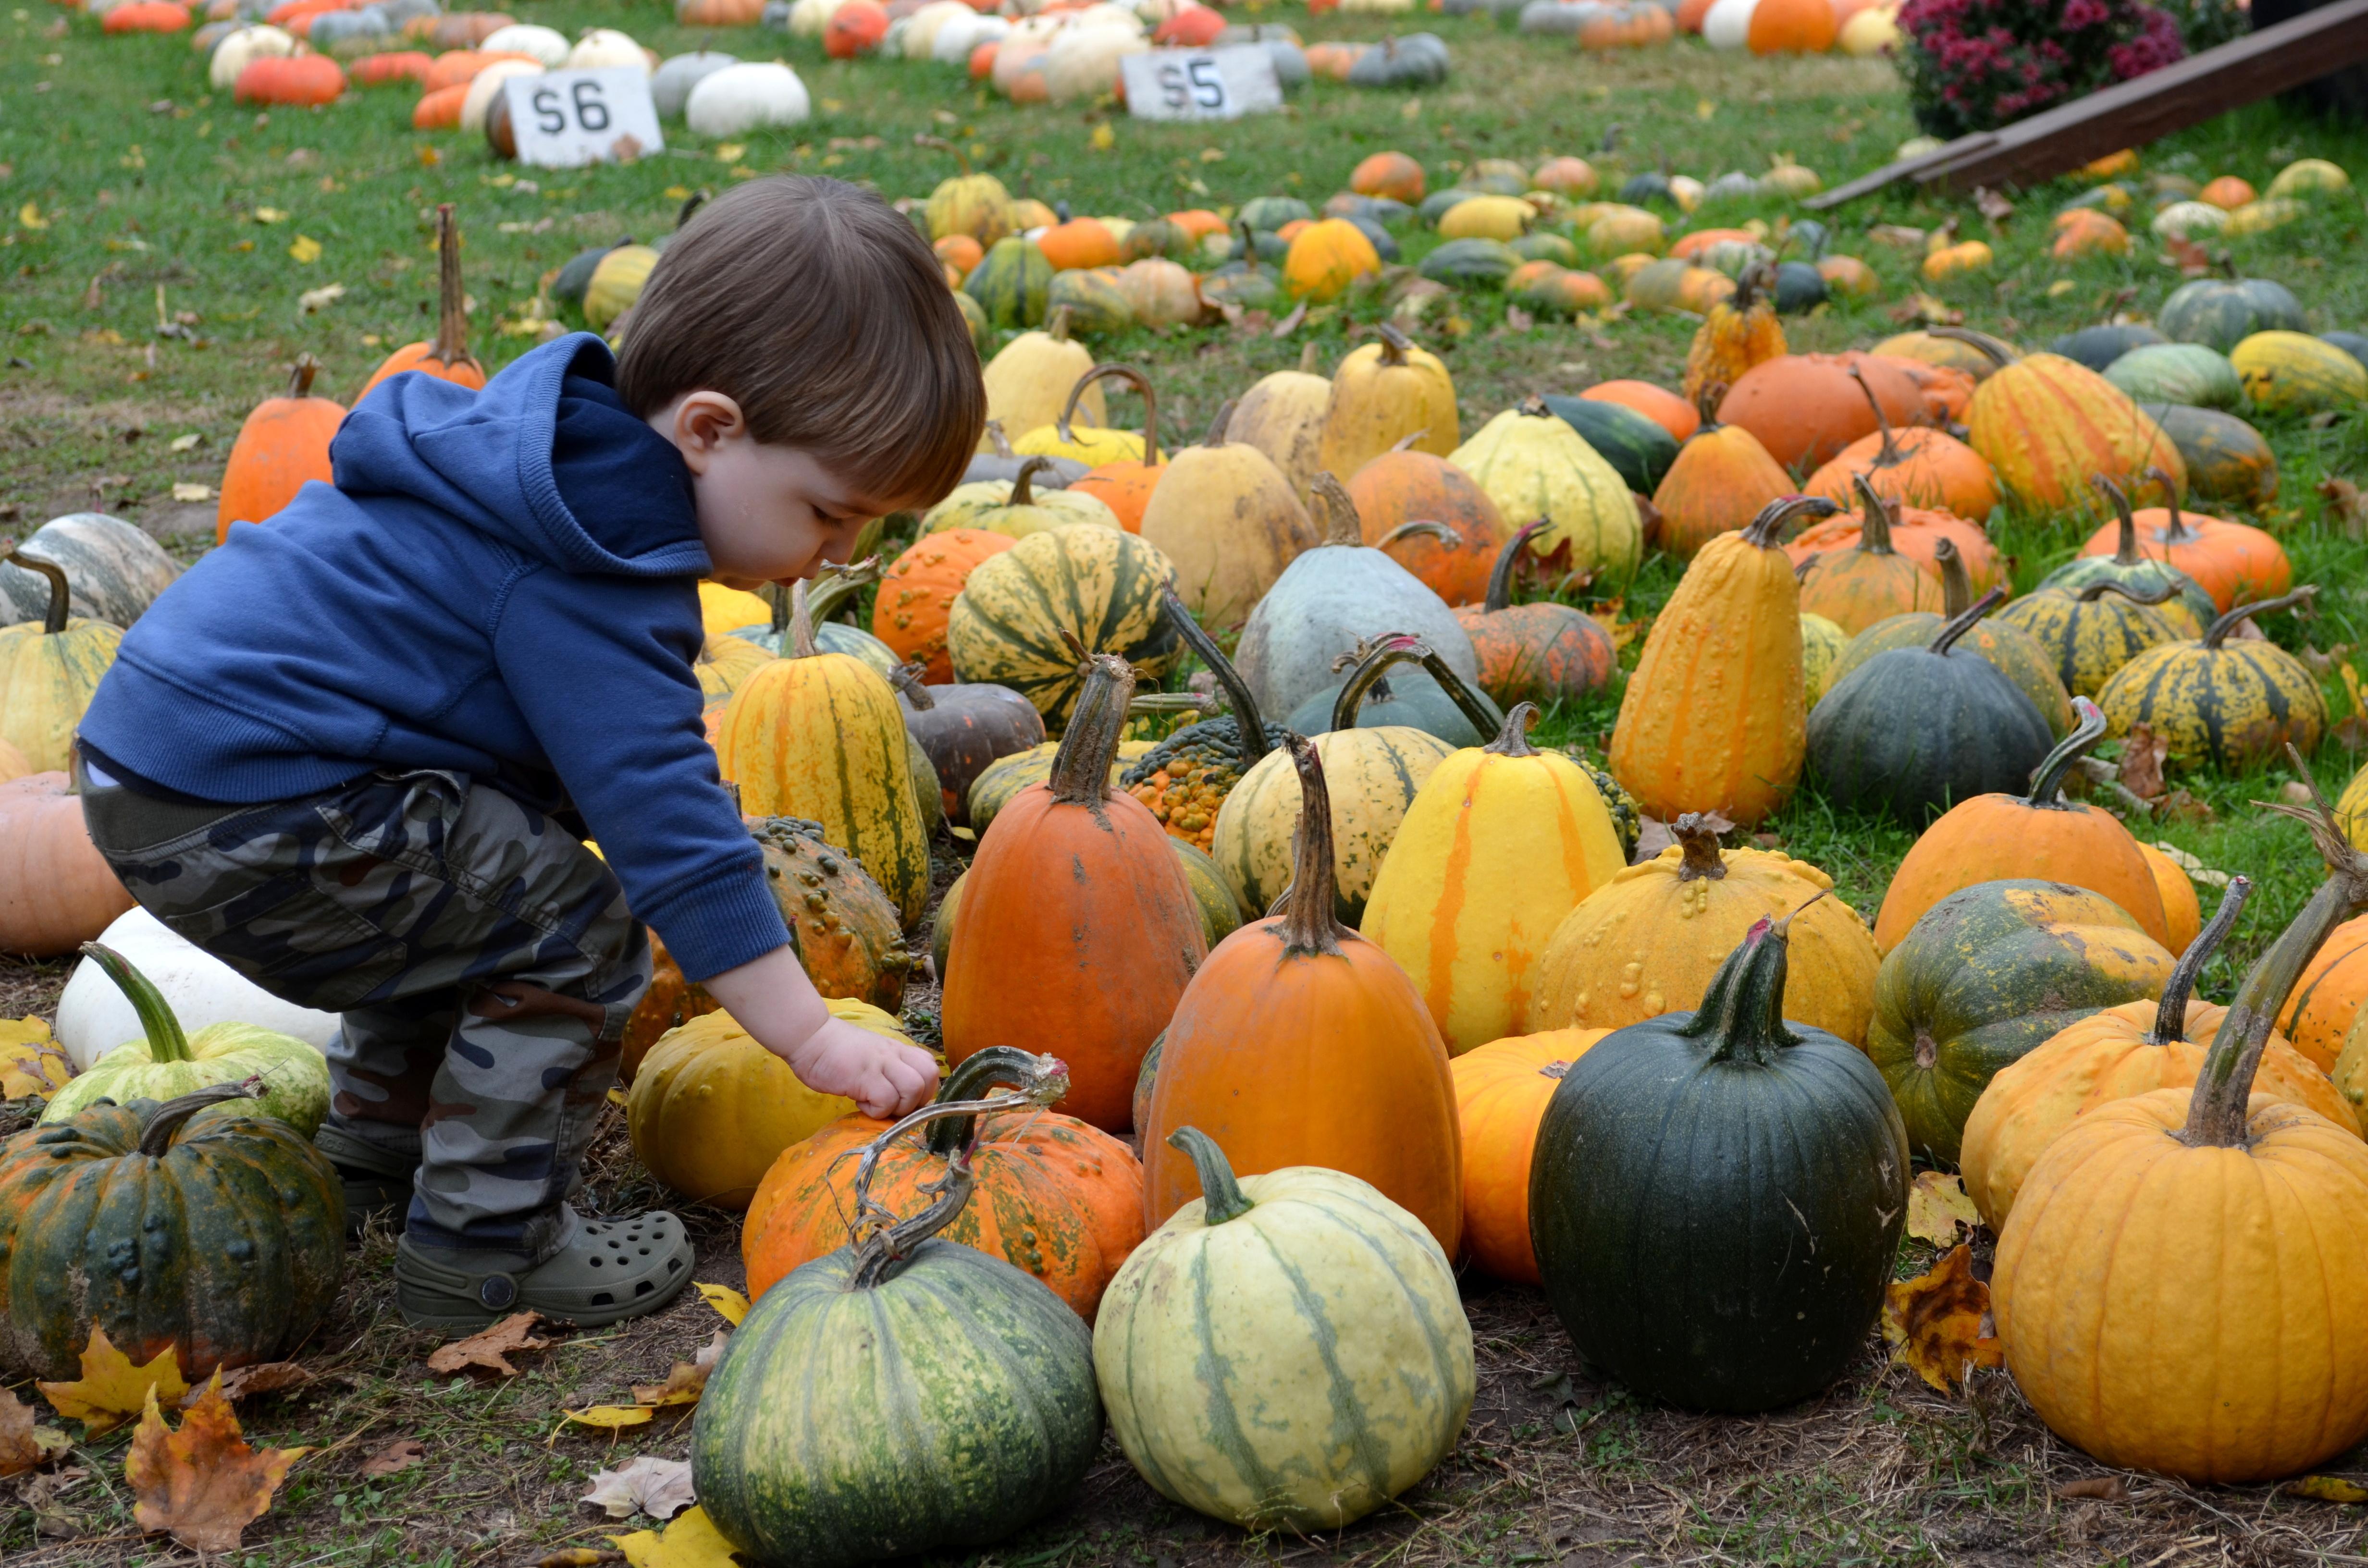 Columbus Gas Prices >> Columbus Pumpkin Patches, Farm Activities, and Corn Mazes